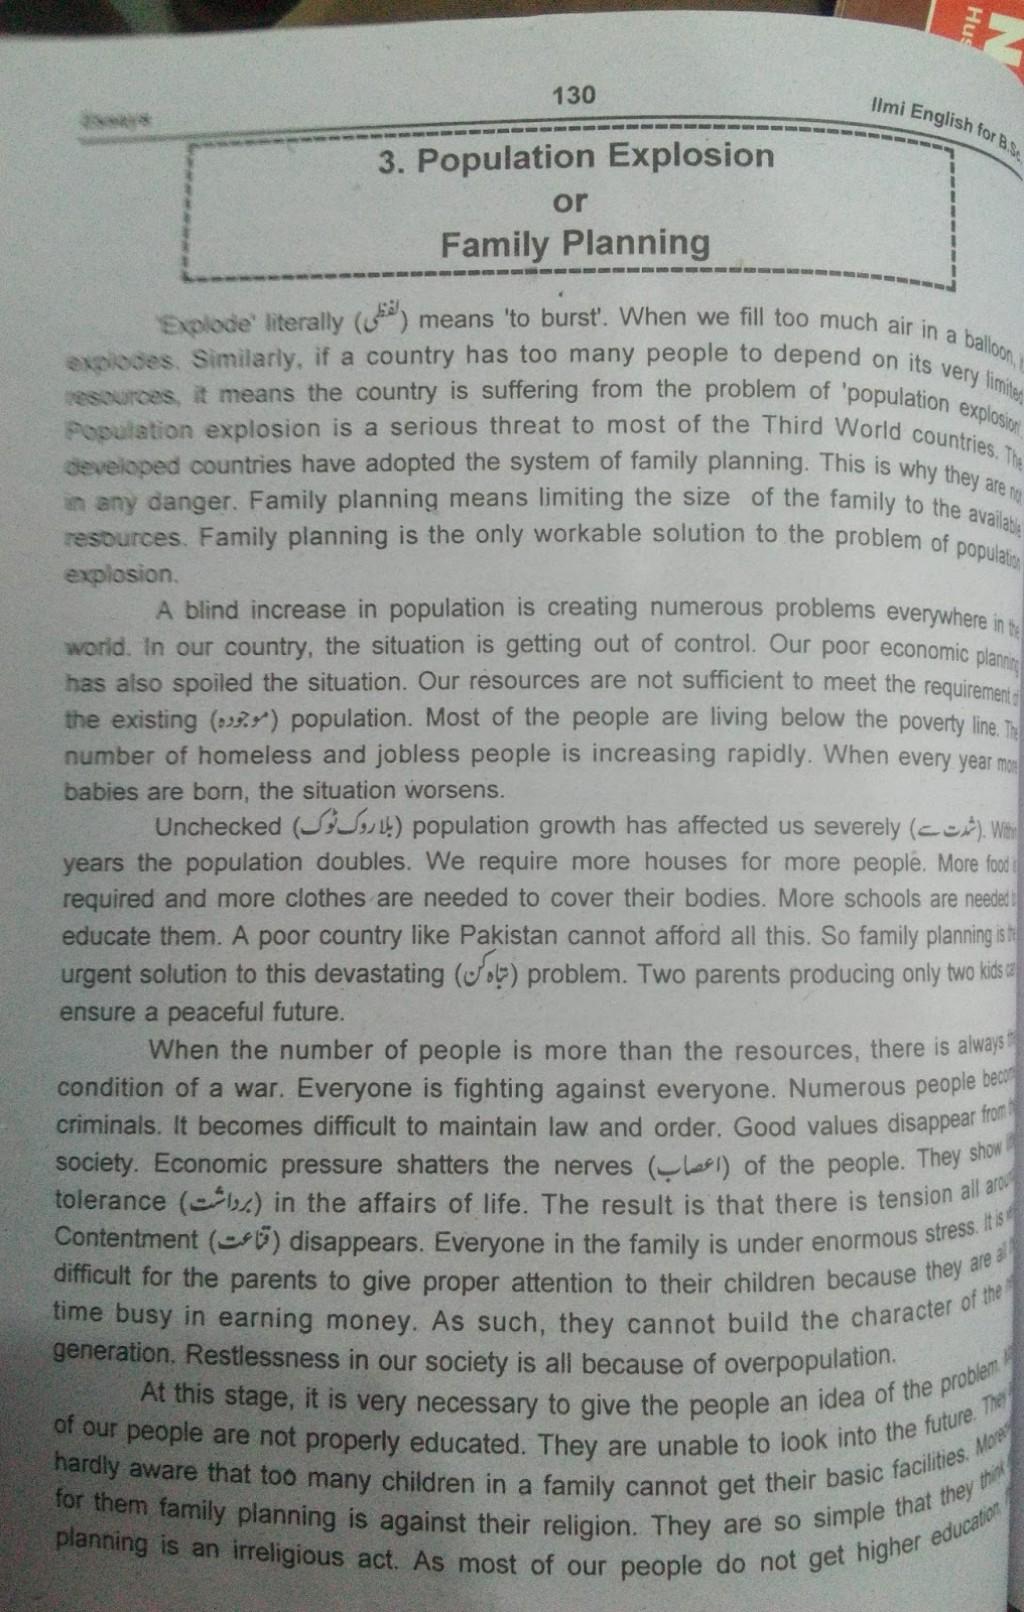 007 Essay On Population Family2bplaning Impressive Control Explosion In Kannada Pakistan Large